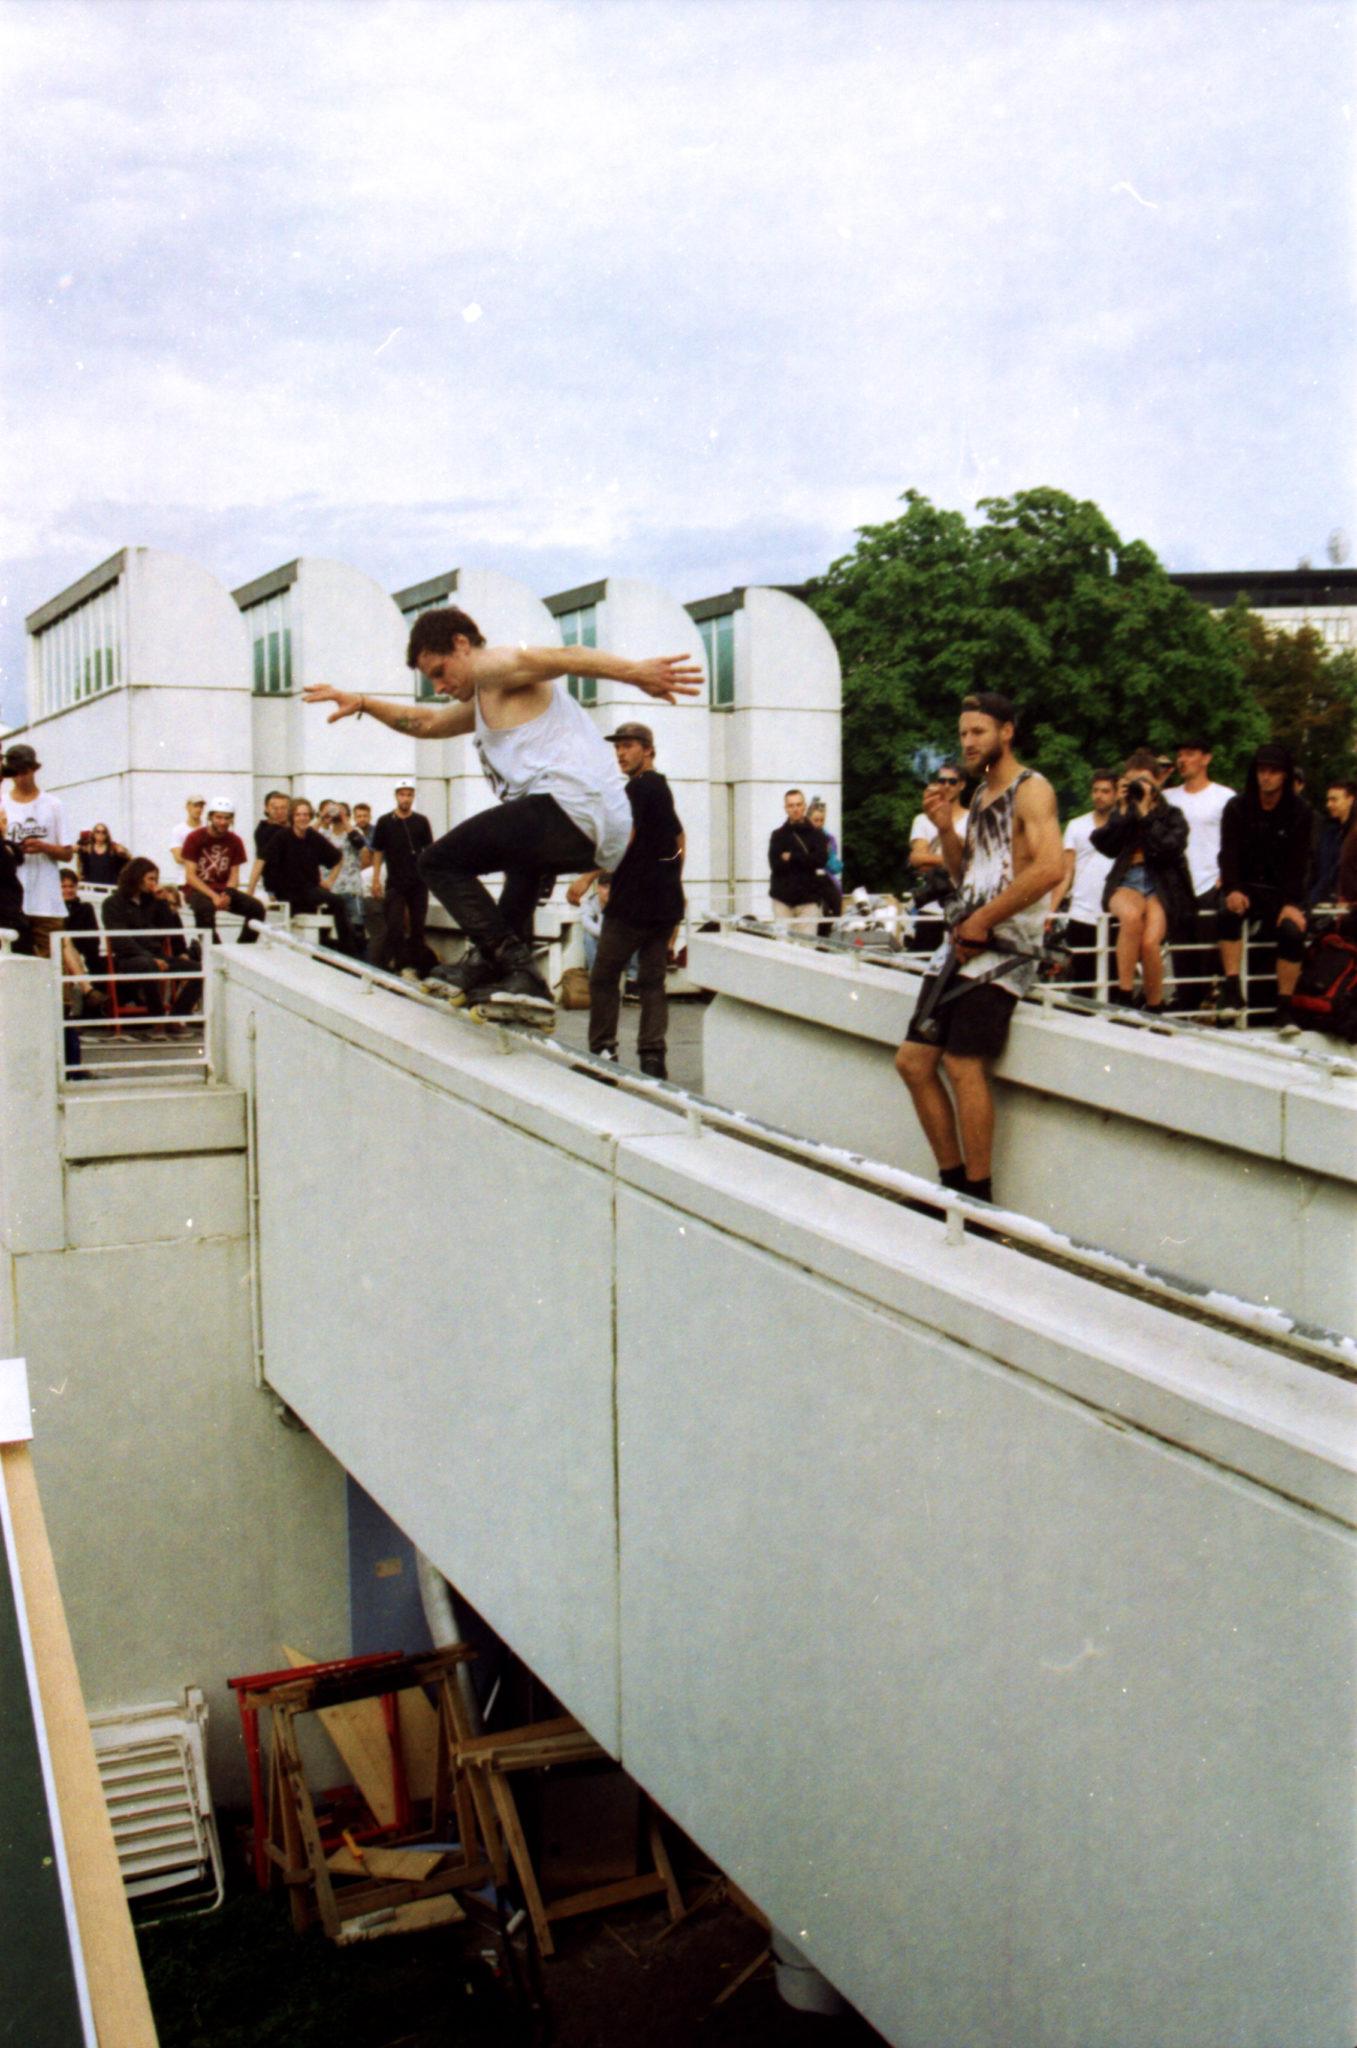 Abriss III - Dave Mutschall Kindgrind